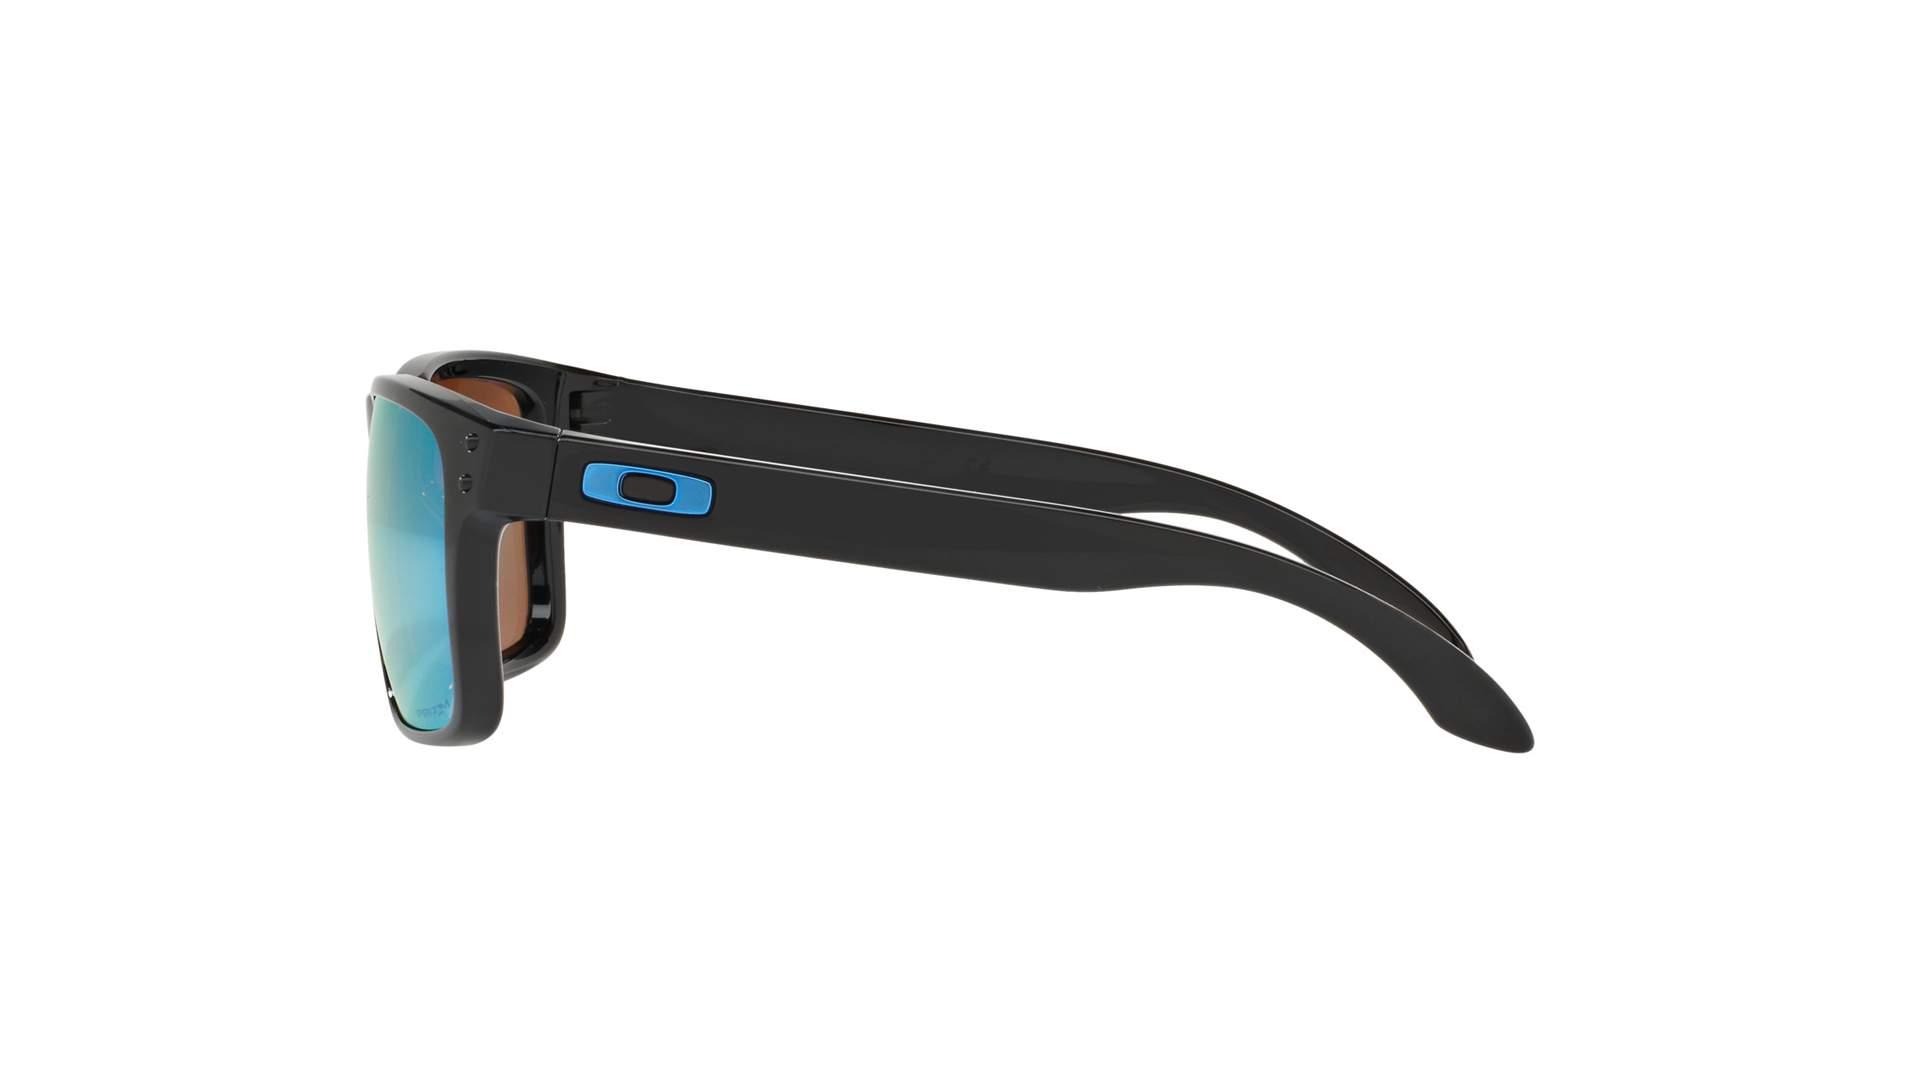 6ff435aaa5 Sunglasses Oakley Holbrook Black Prizm OO9102 C1 55-18 Large Polarized  Mirror